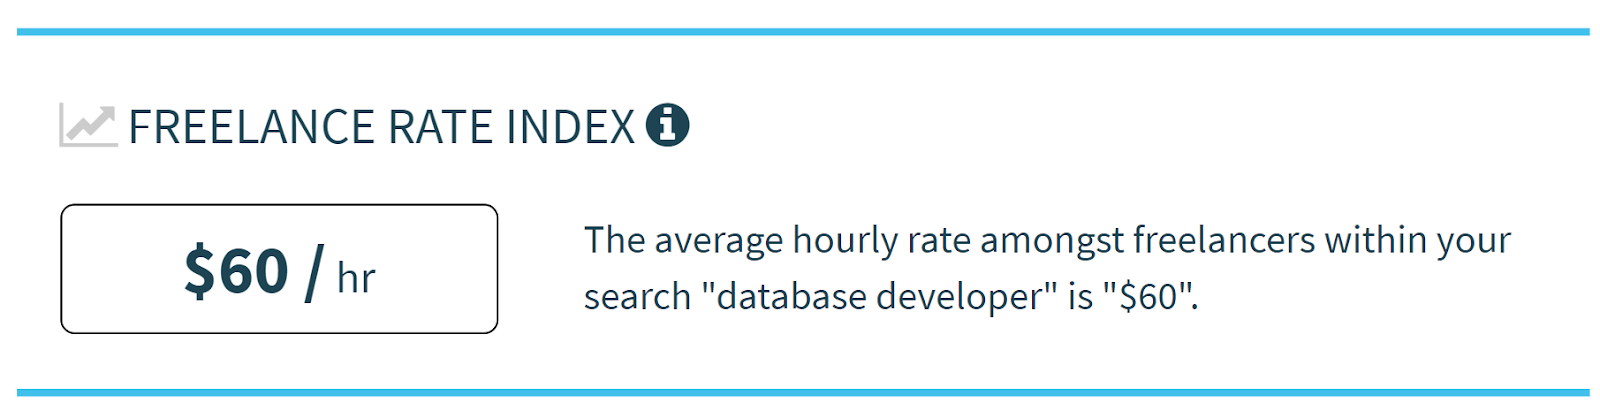 Database Developer - Average Freelance Rate